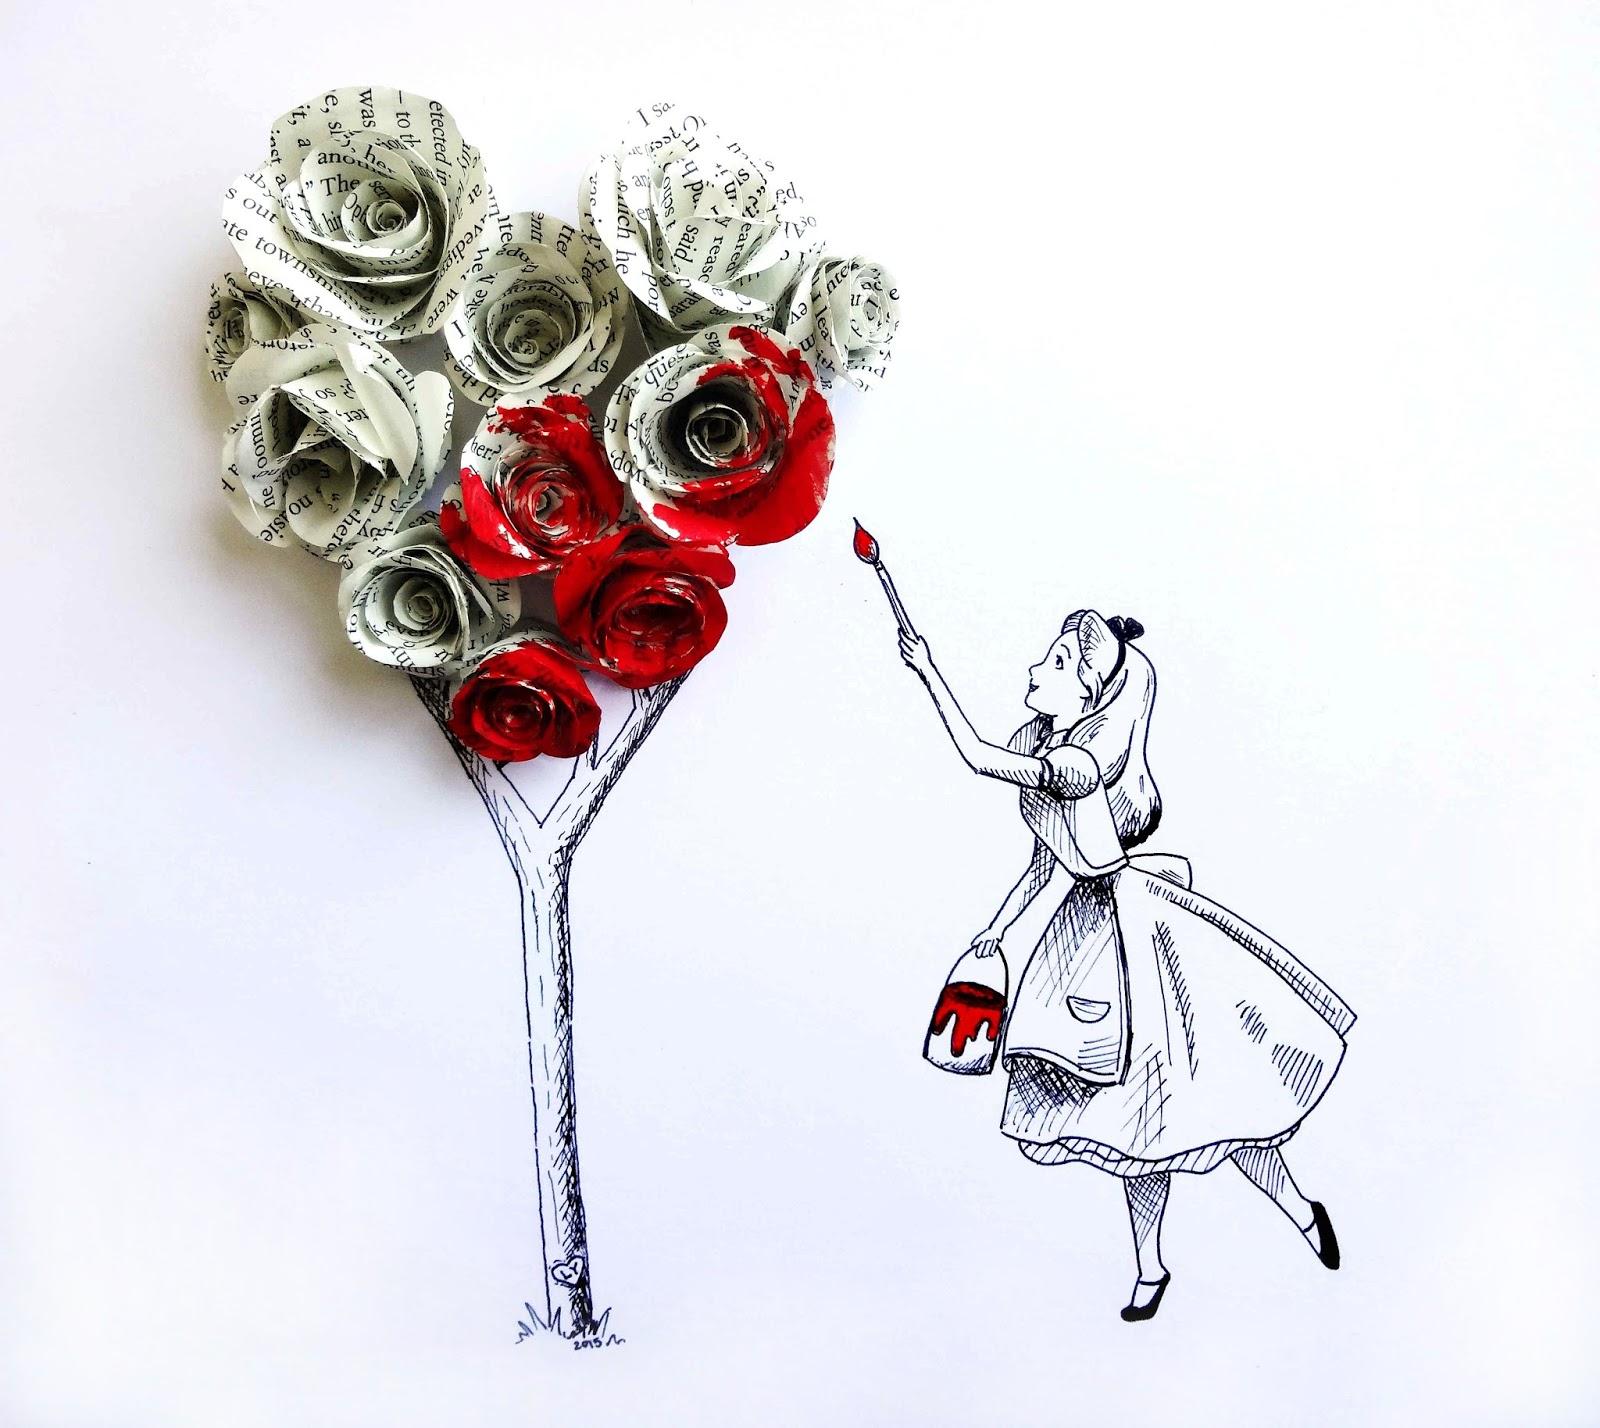 Drawn alice in wonderland rose #6